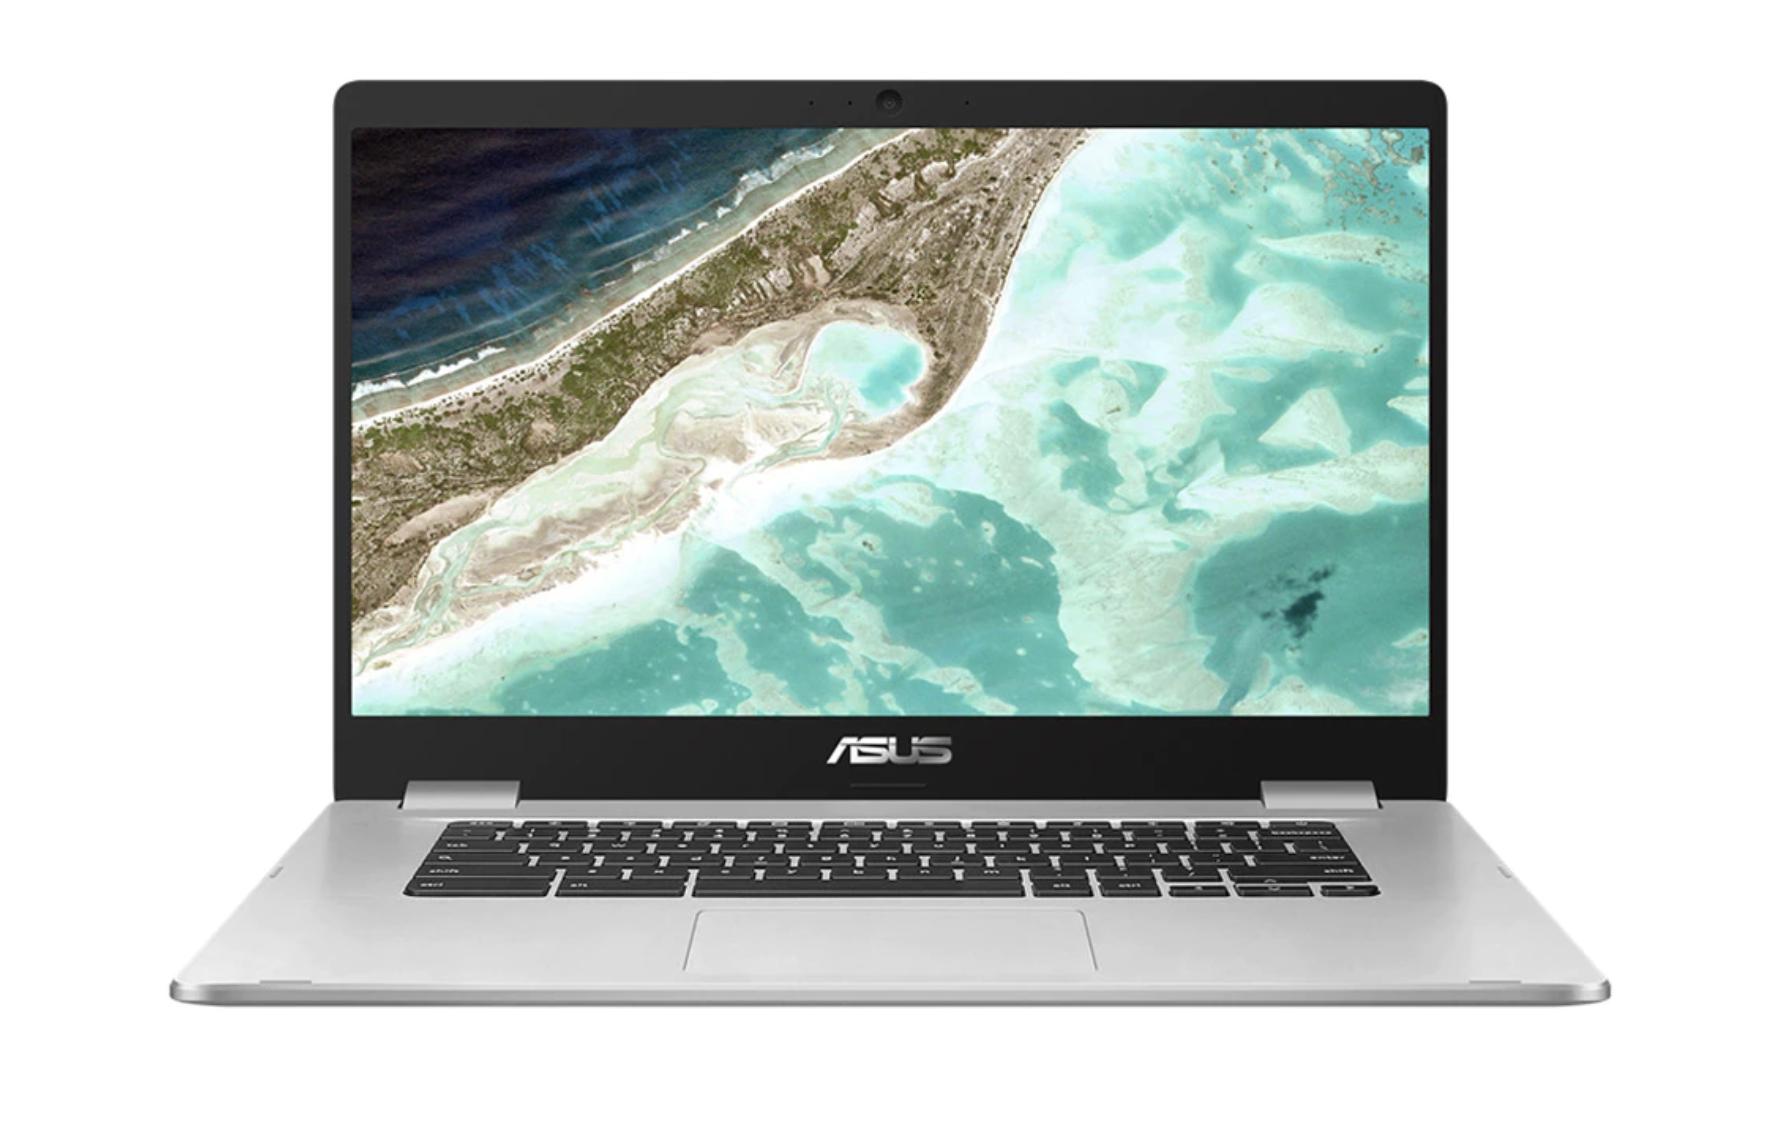 Chromebook portátil ASUS Z1500CN-EJ0400 (C523), Intel Celeron, 8GB, 64GB eMMC